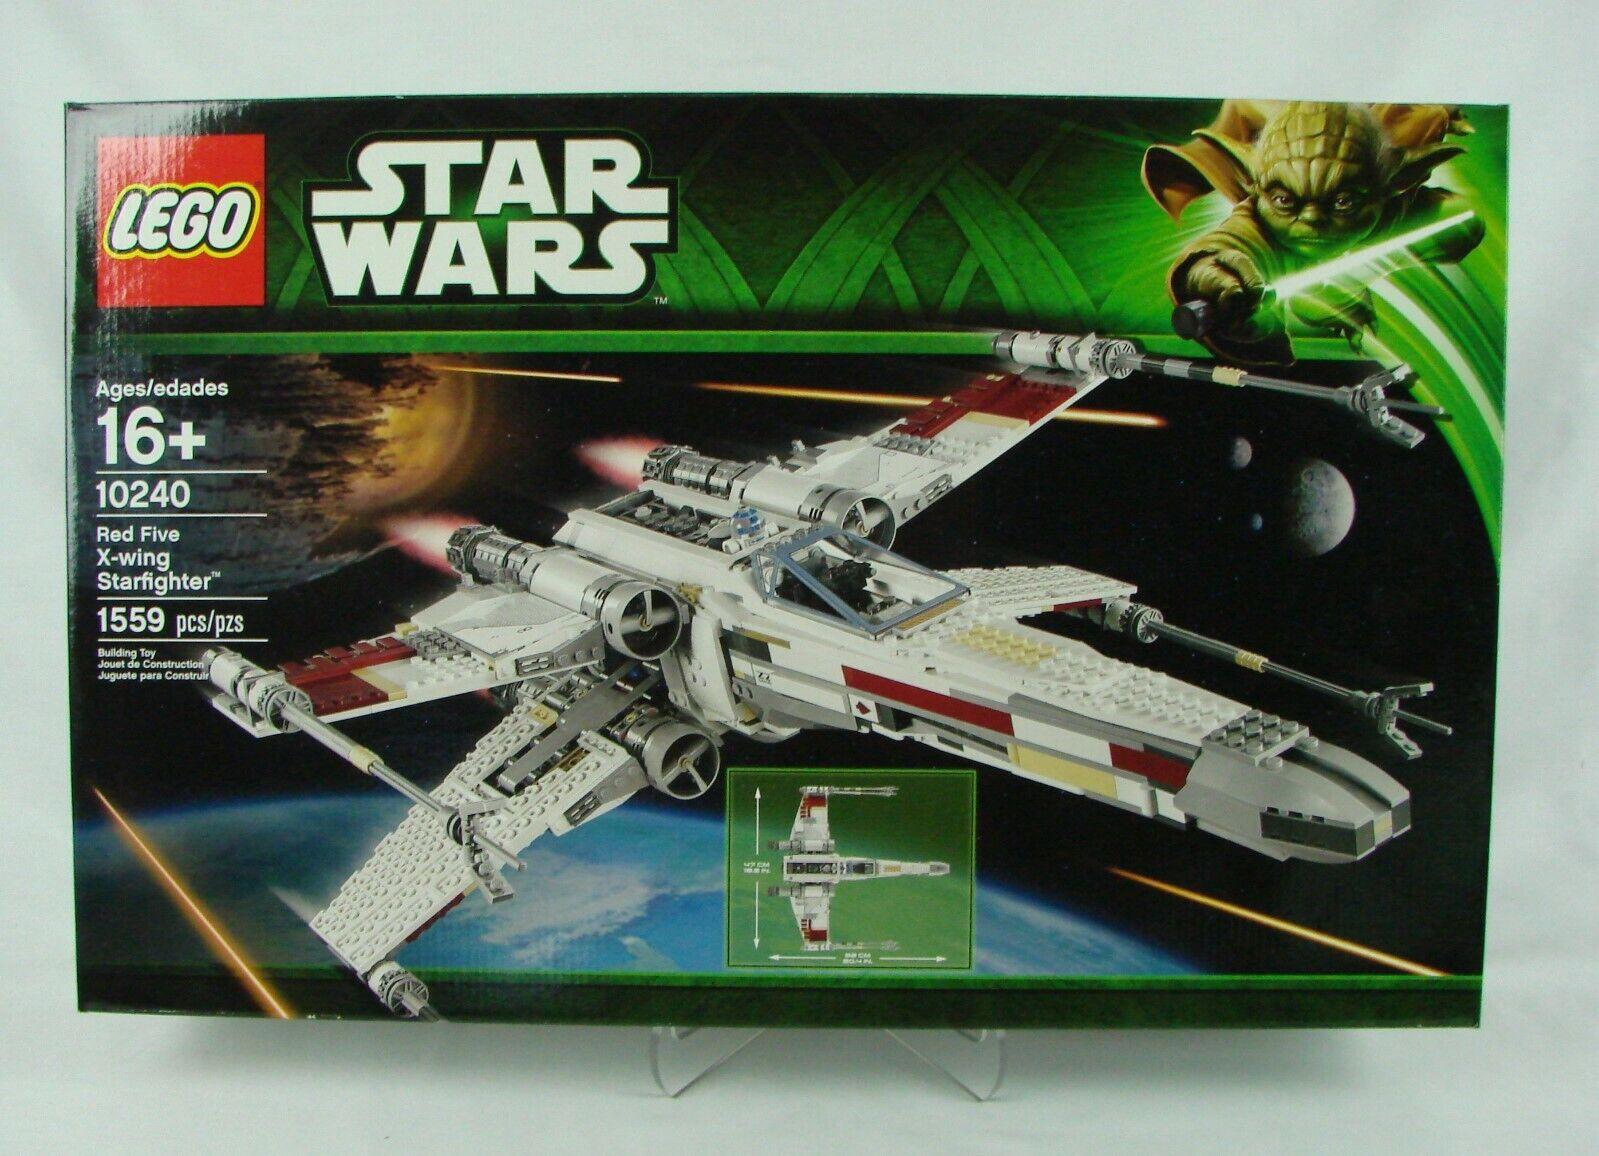 LEGO LEGO LEGO Star Wars UCS  Red Five X-wing Starfighter   (2013) 1559 pcs  NISB a21783